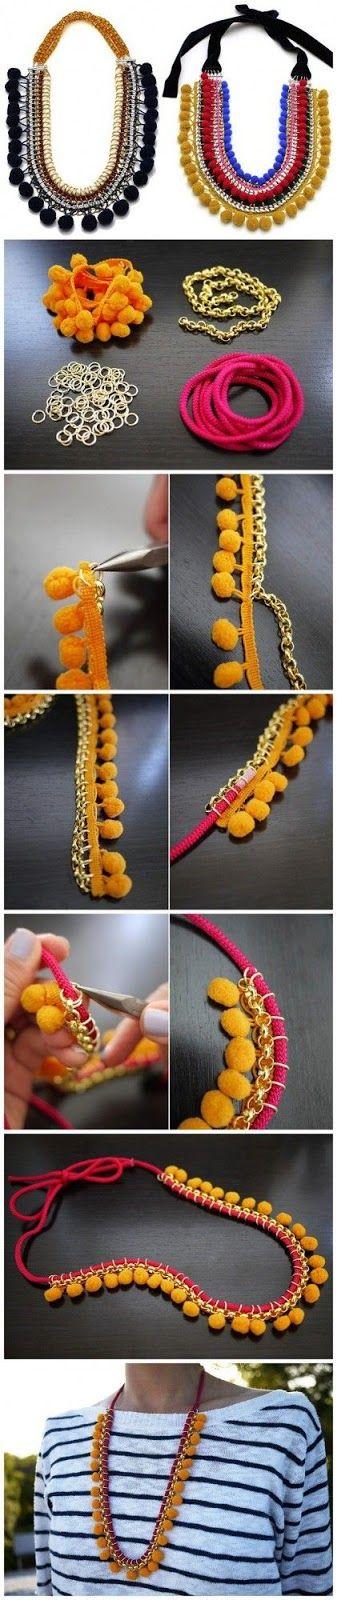 DIY Necklaces #jewelry